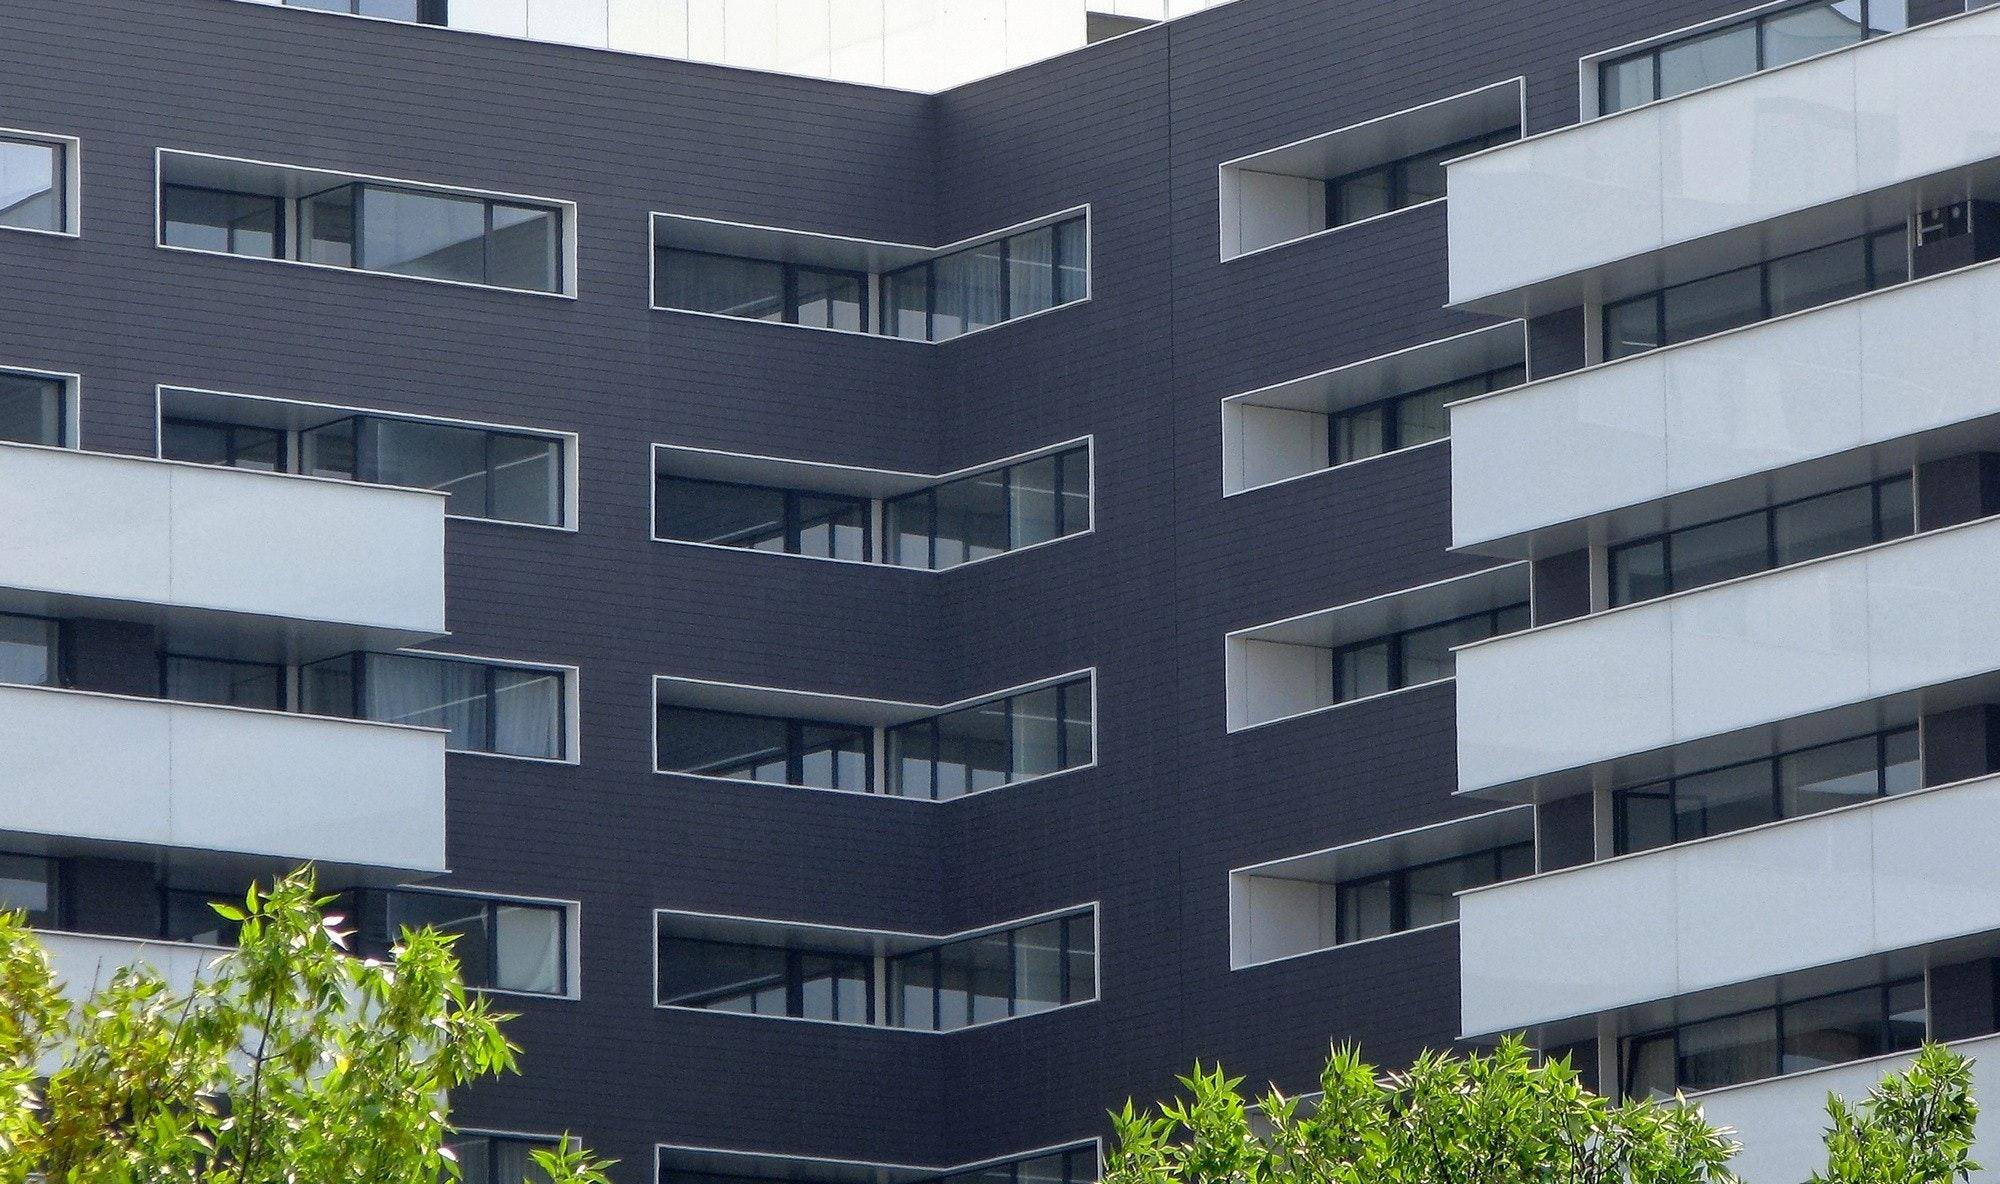 shady-tree-condo-multifamily-residential.jpg